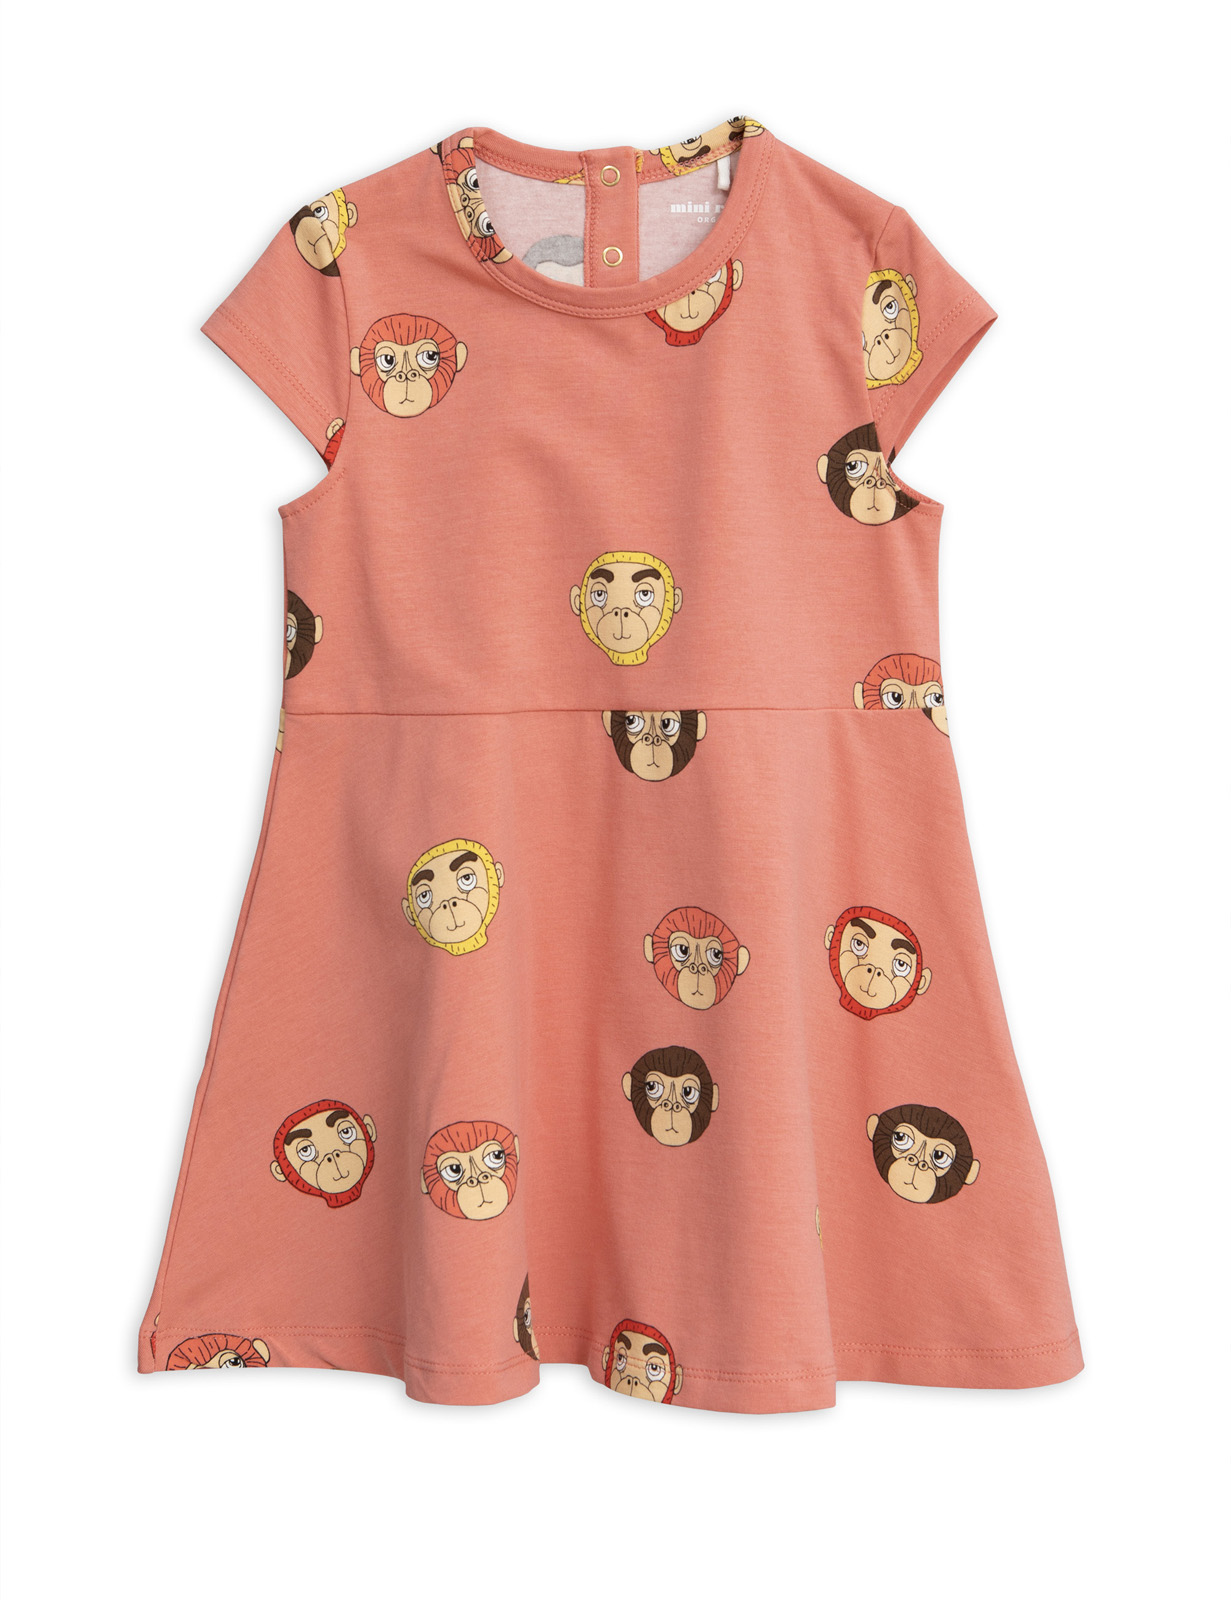 1925012628-1-mini-rodini-monkeys-aop-ss-dress-pink.jpg